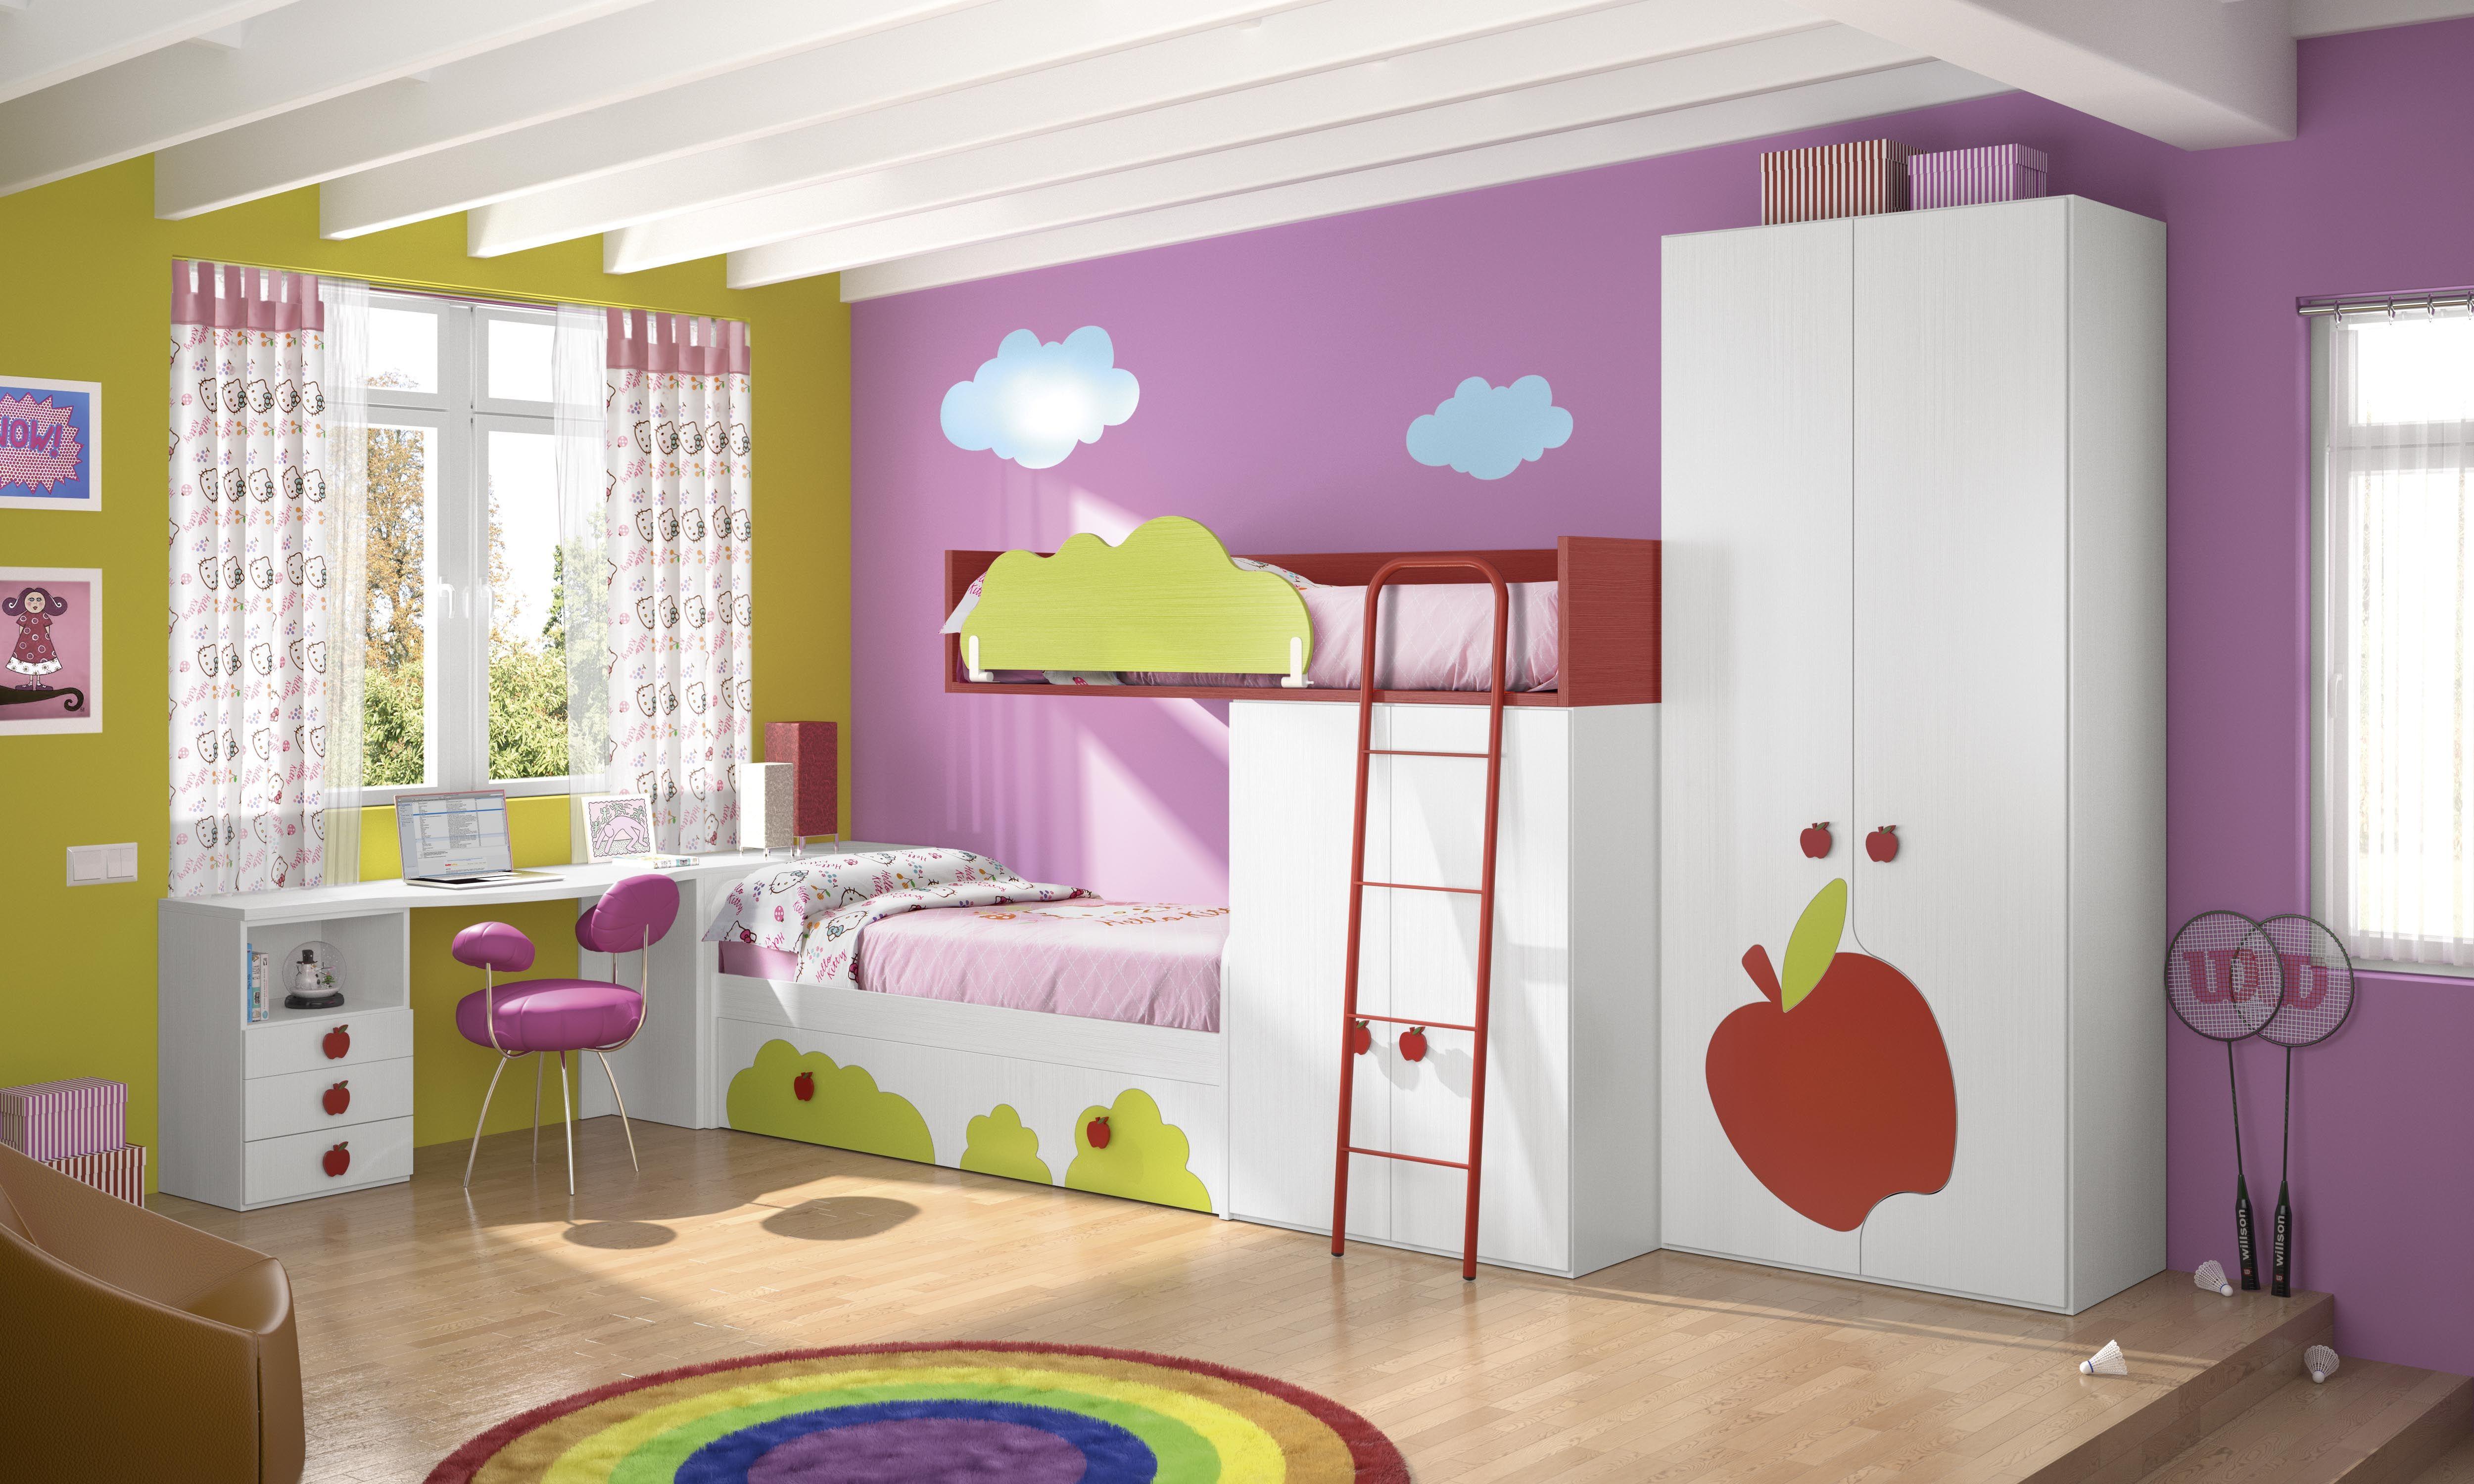 Habitaciones infantiles tem ticas paisajes dibujos - Habitaciones infantiles tematicas ...